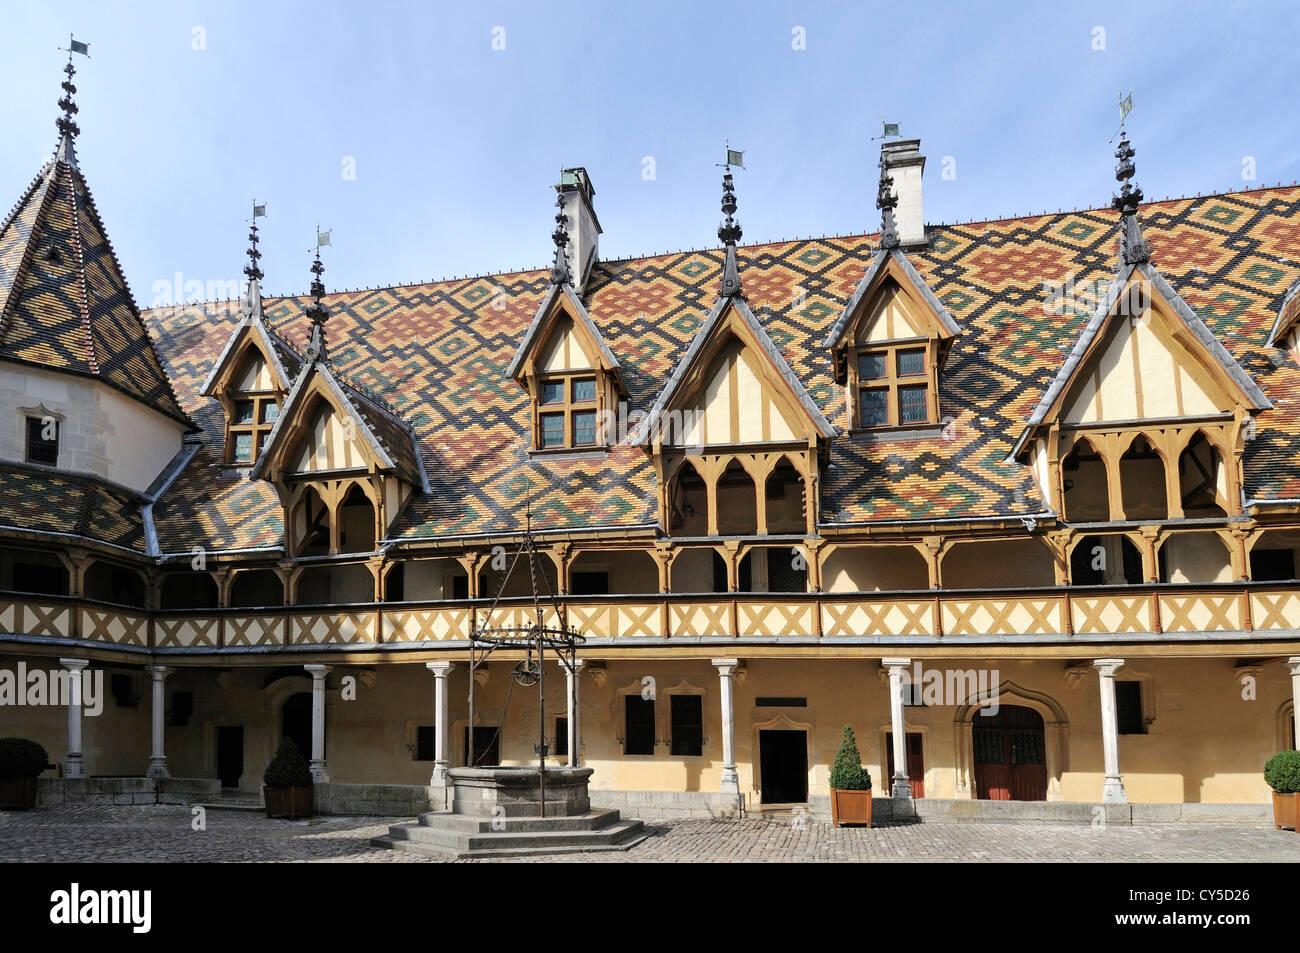 Hospices de Beaune, Hotel Dieu, Beaune, Burgundy, Cote d'Or, France, Europe - Stock Image